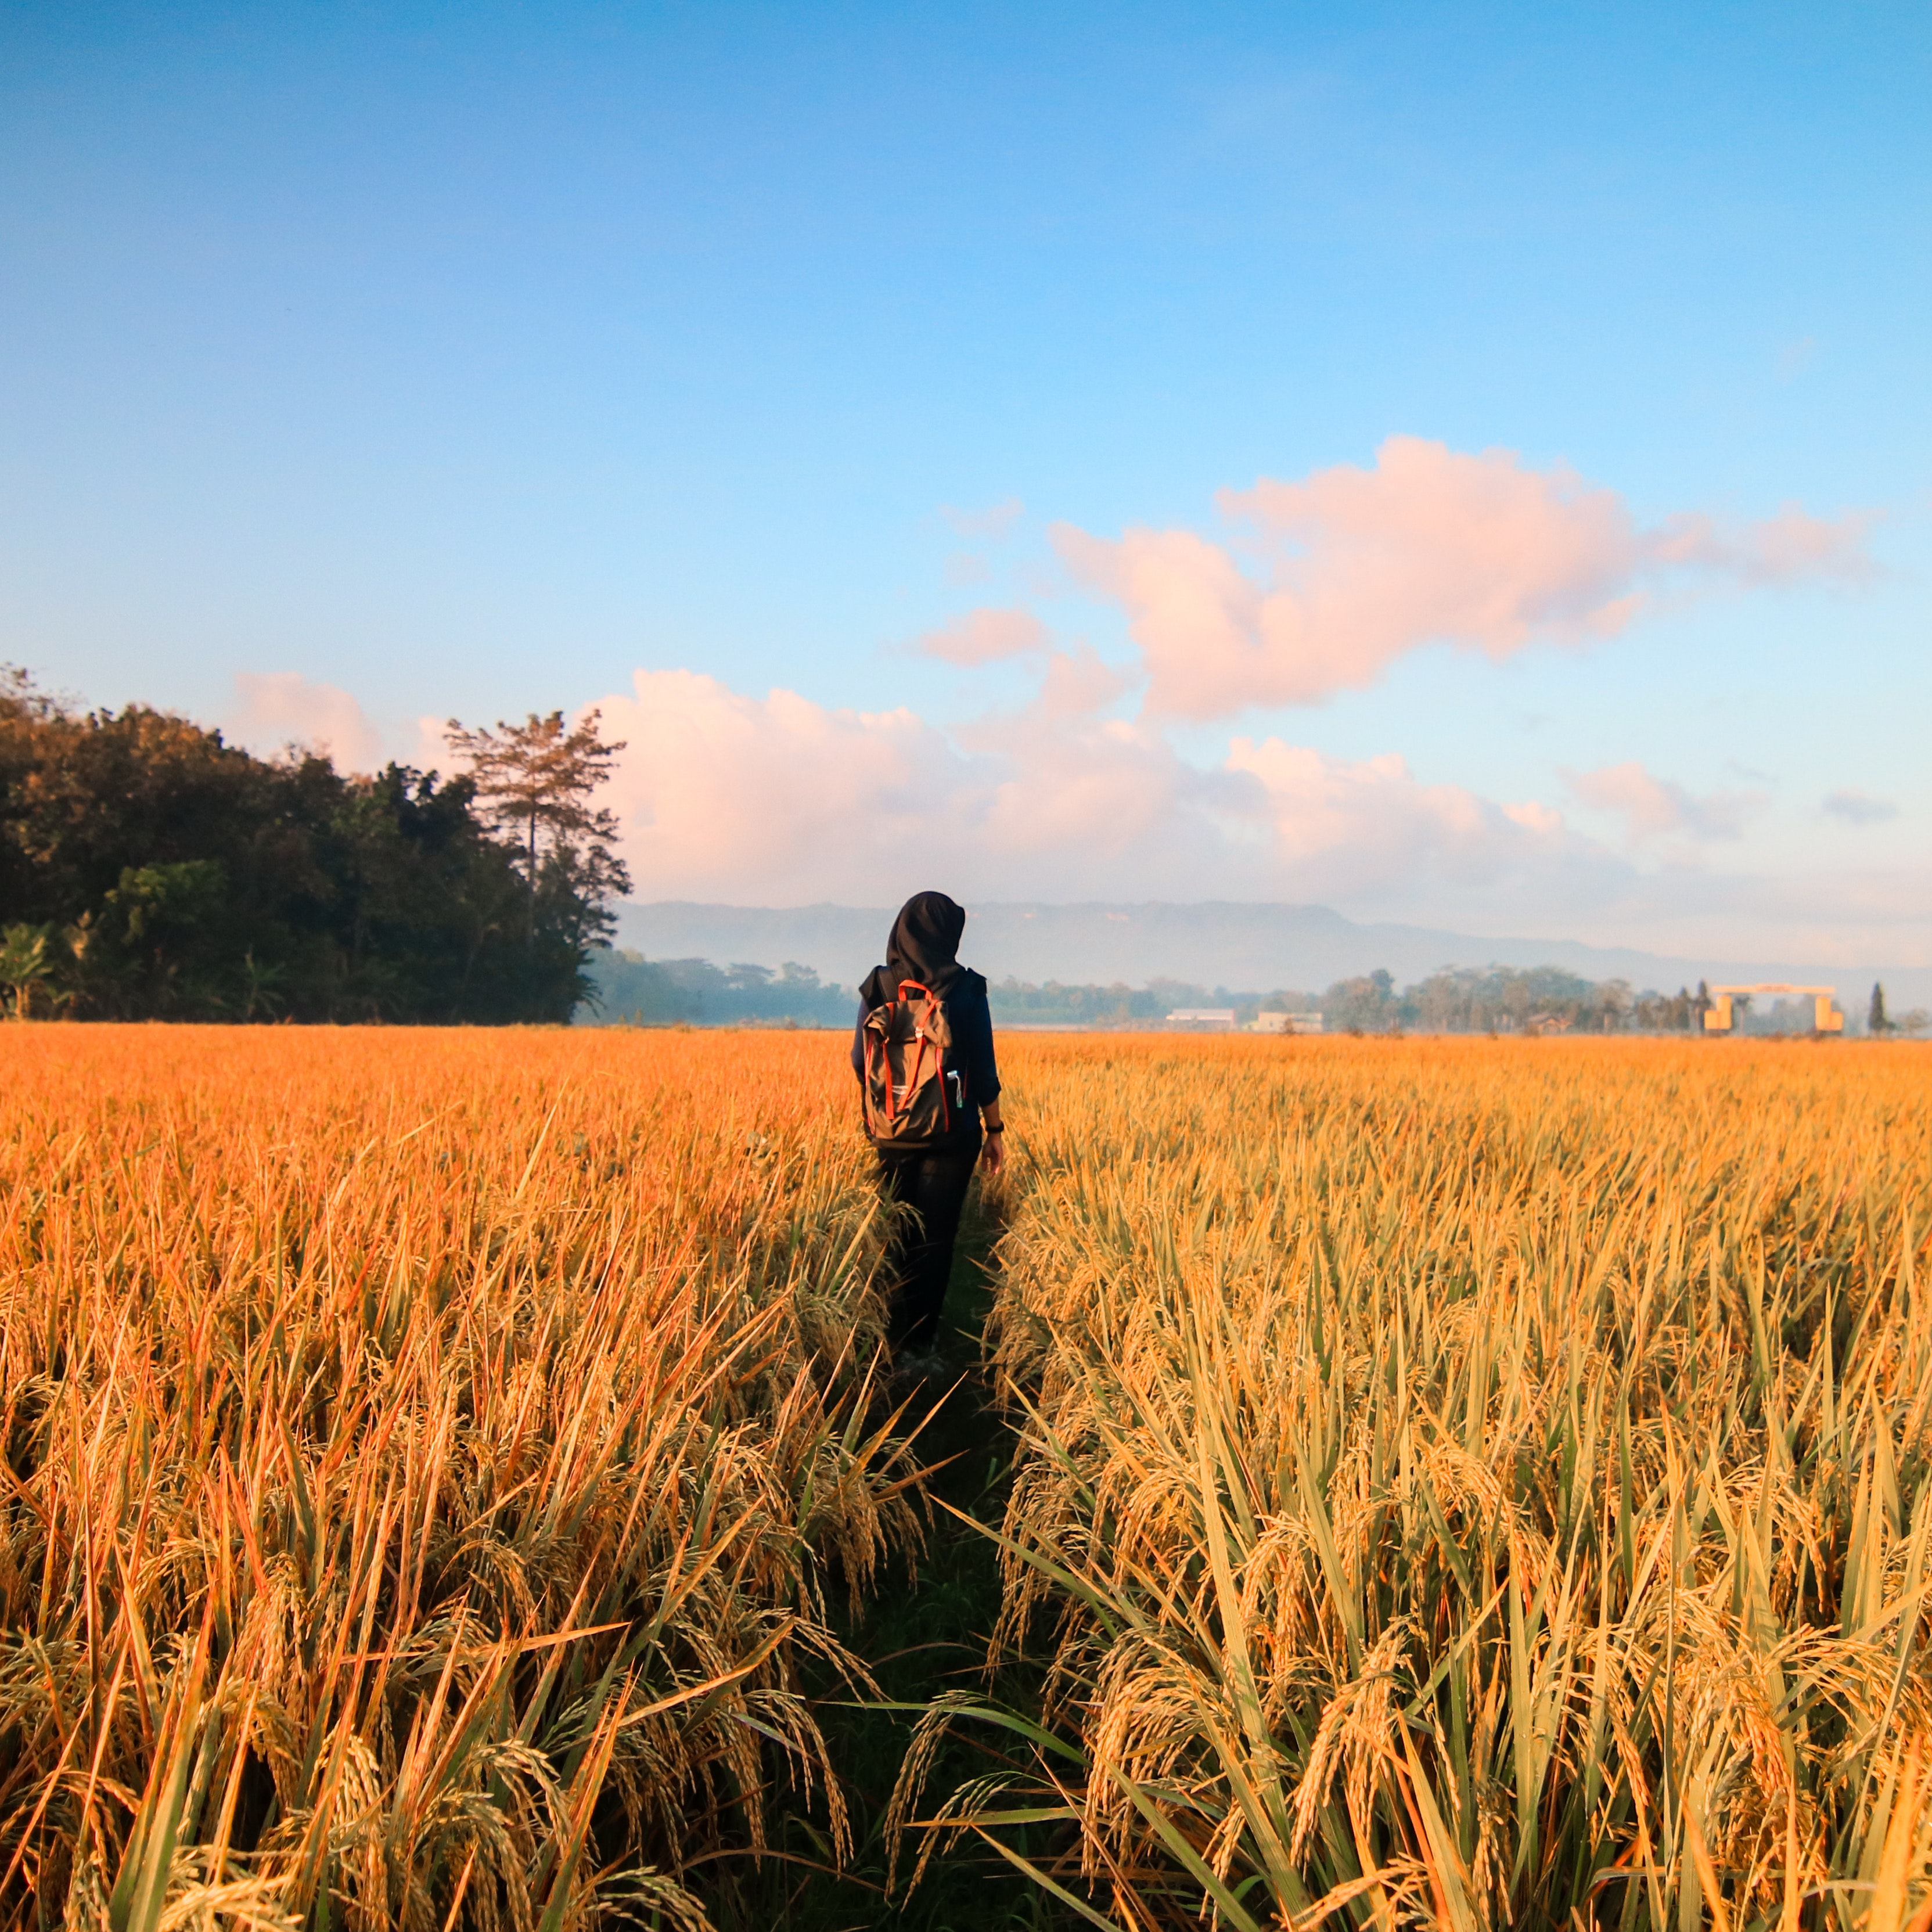 Woman in Black Hijab Headscarf Walking on Field, Adventure, Sunrise, Rice field, Rural, HQ Photo